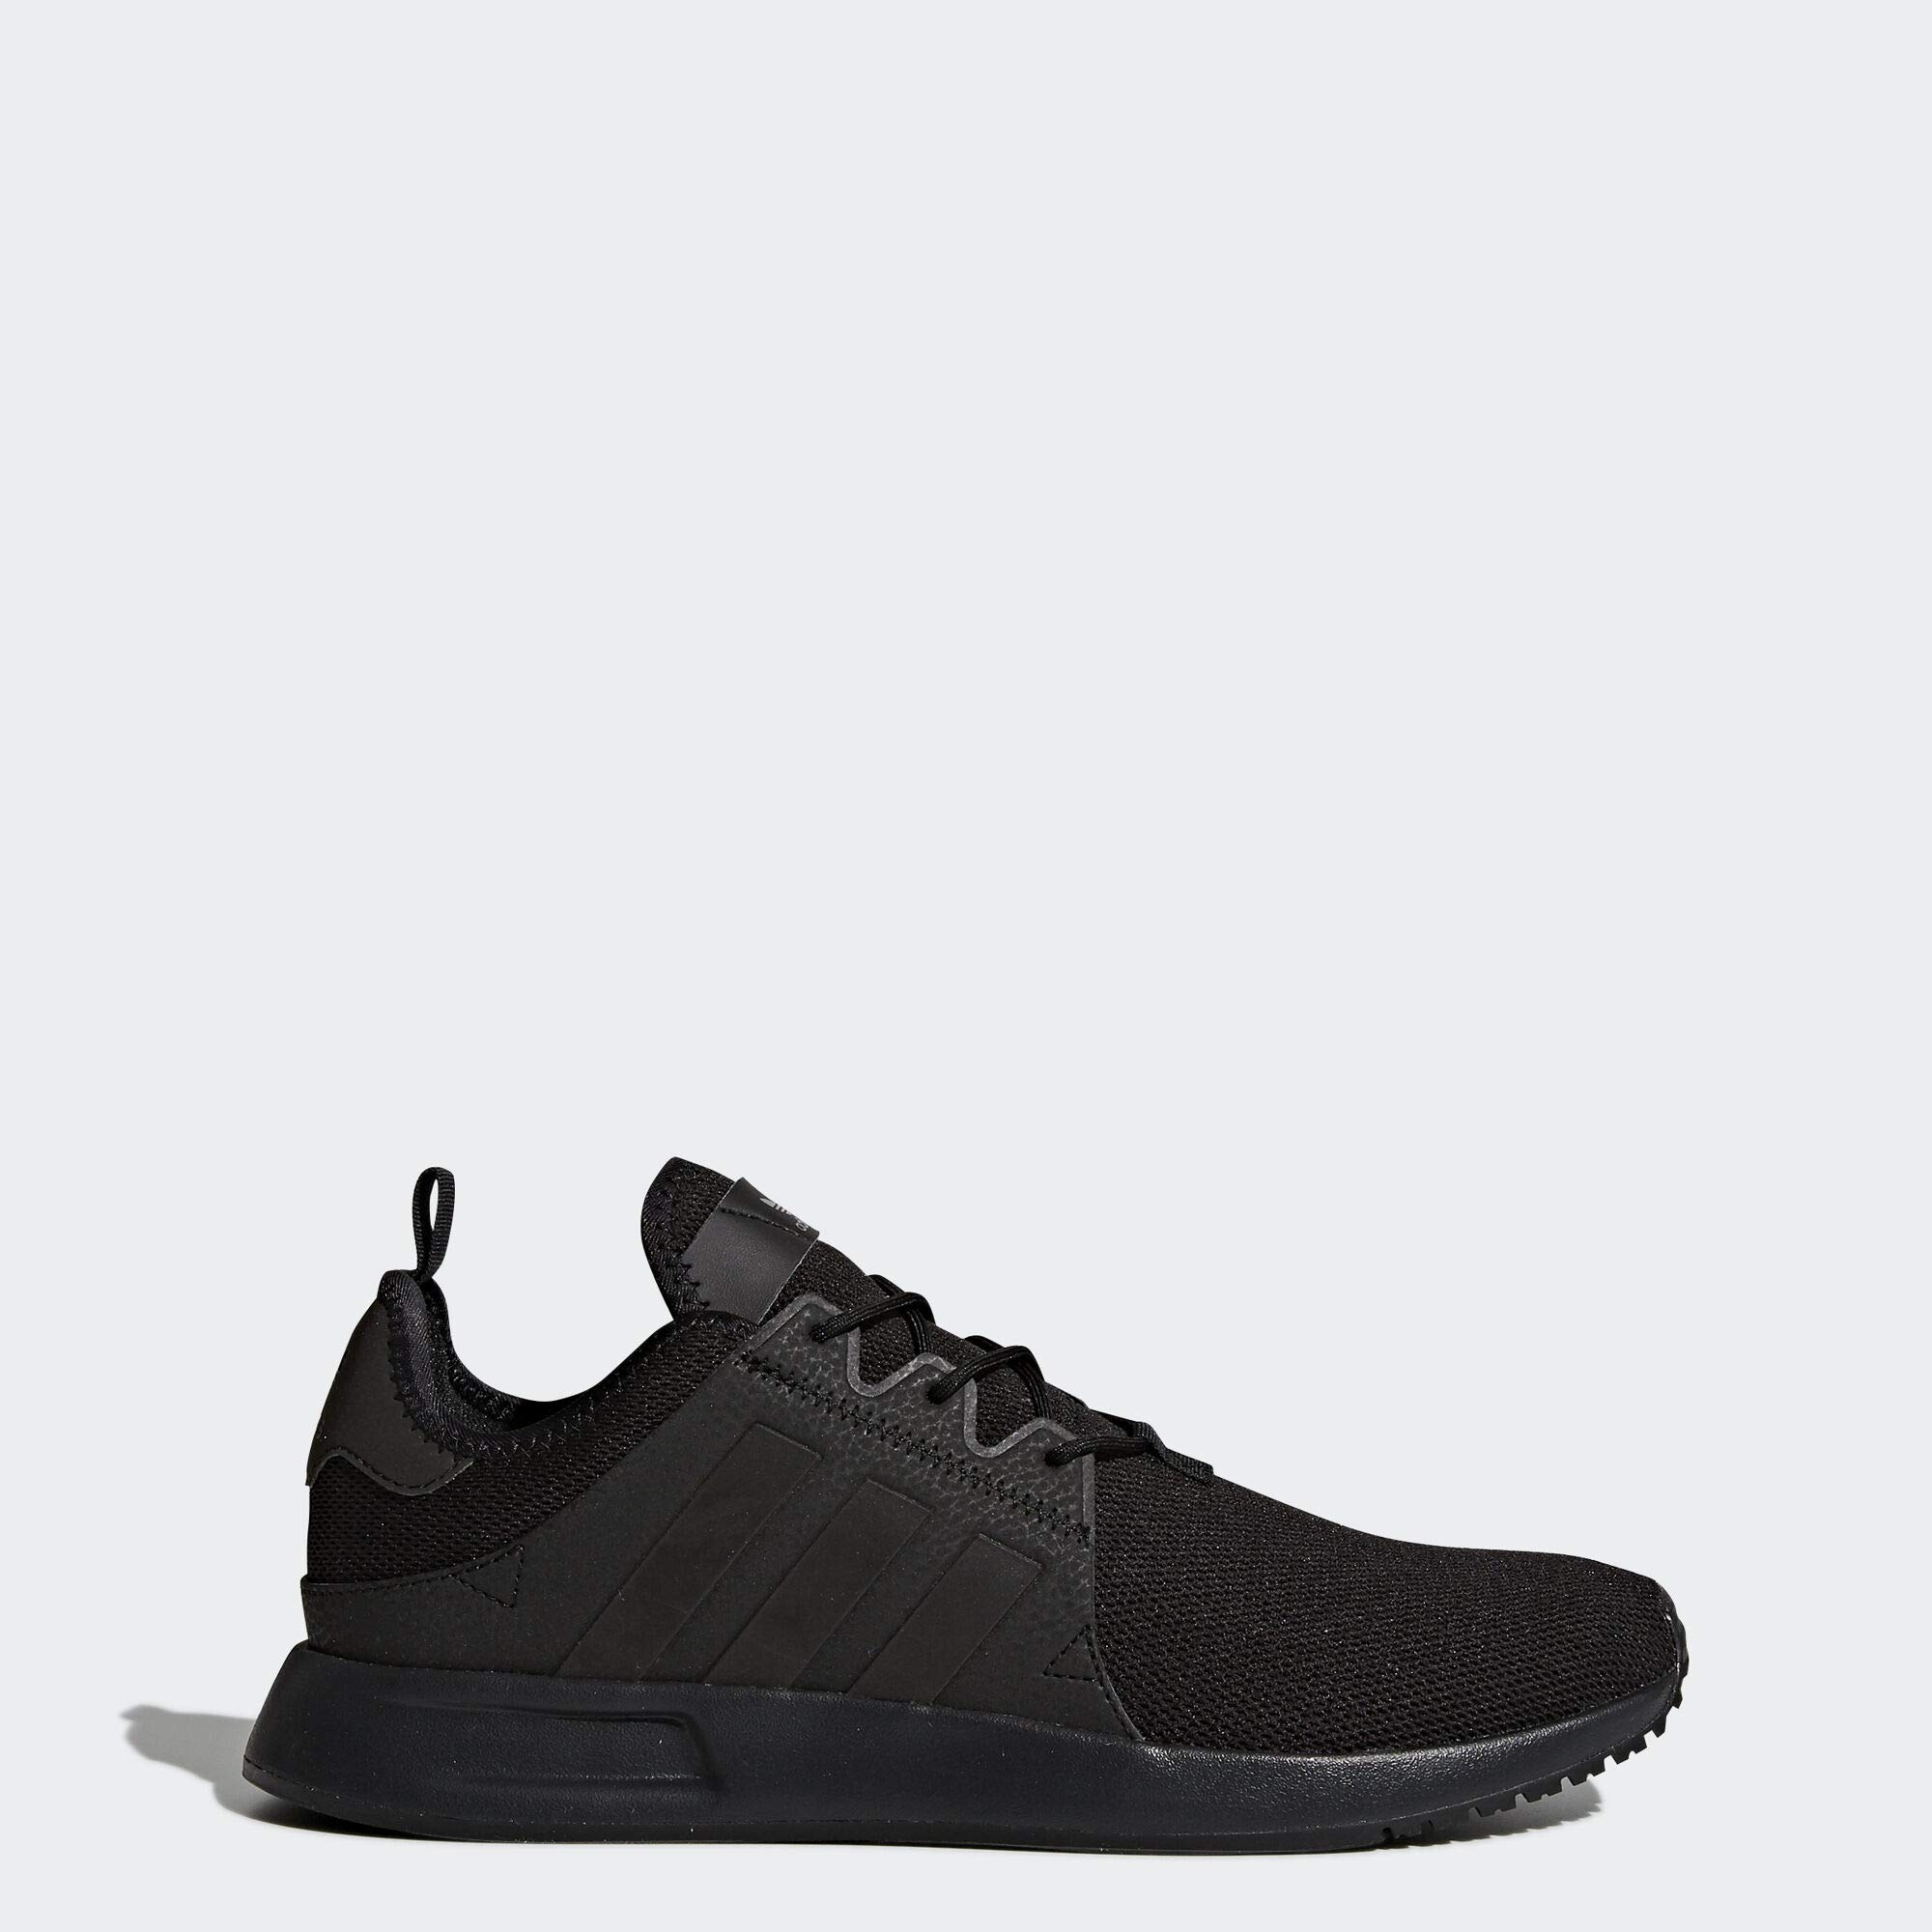 adidas Originals Men's X_PLR Running Shoe, Trace Grey Metallic/Black, 10.5 M US by adidas Originals